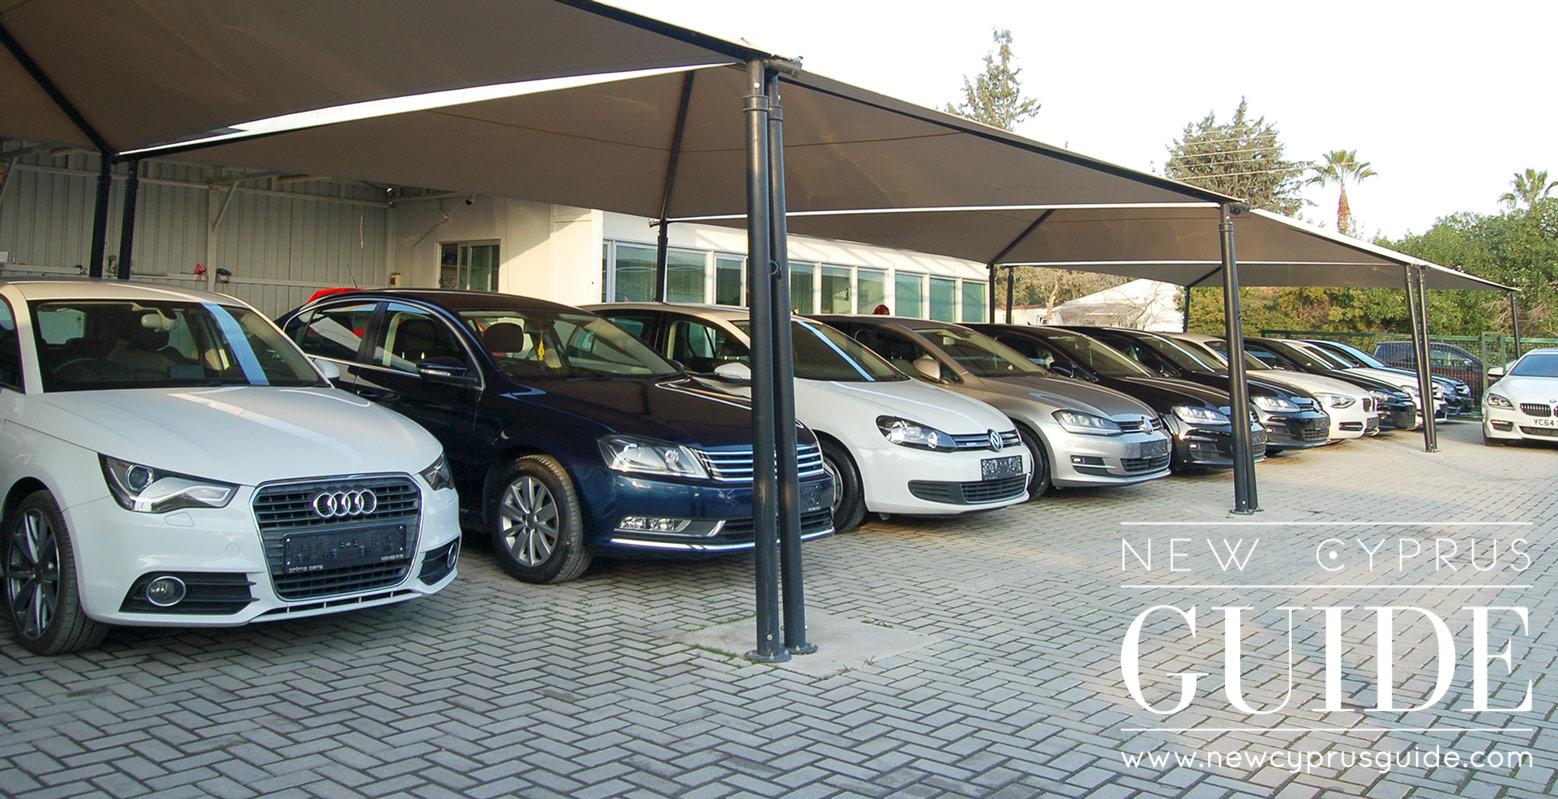 prime car sales new cyprus guide rh newcyprusguide com car sales guide book car sales guide brisbane